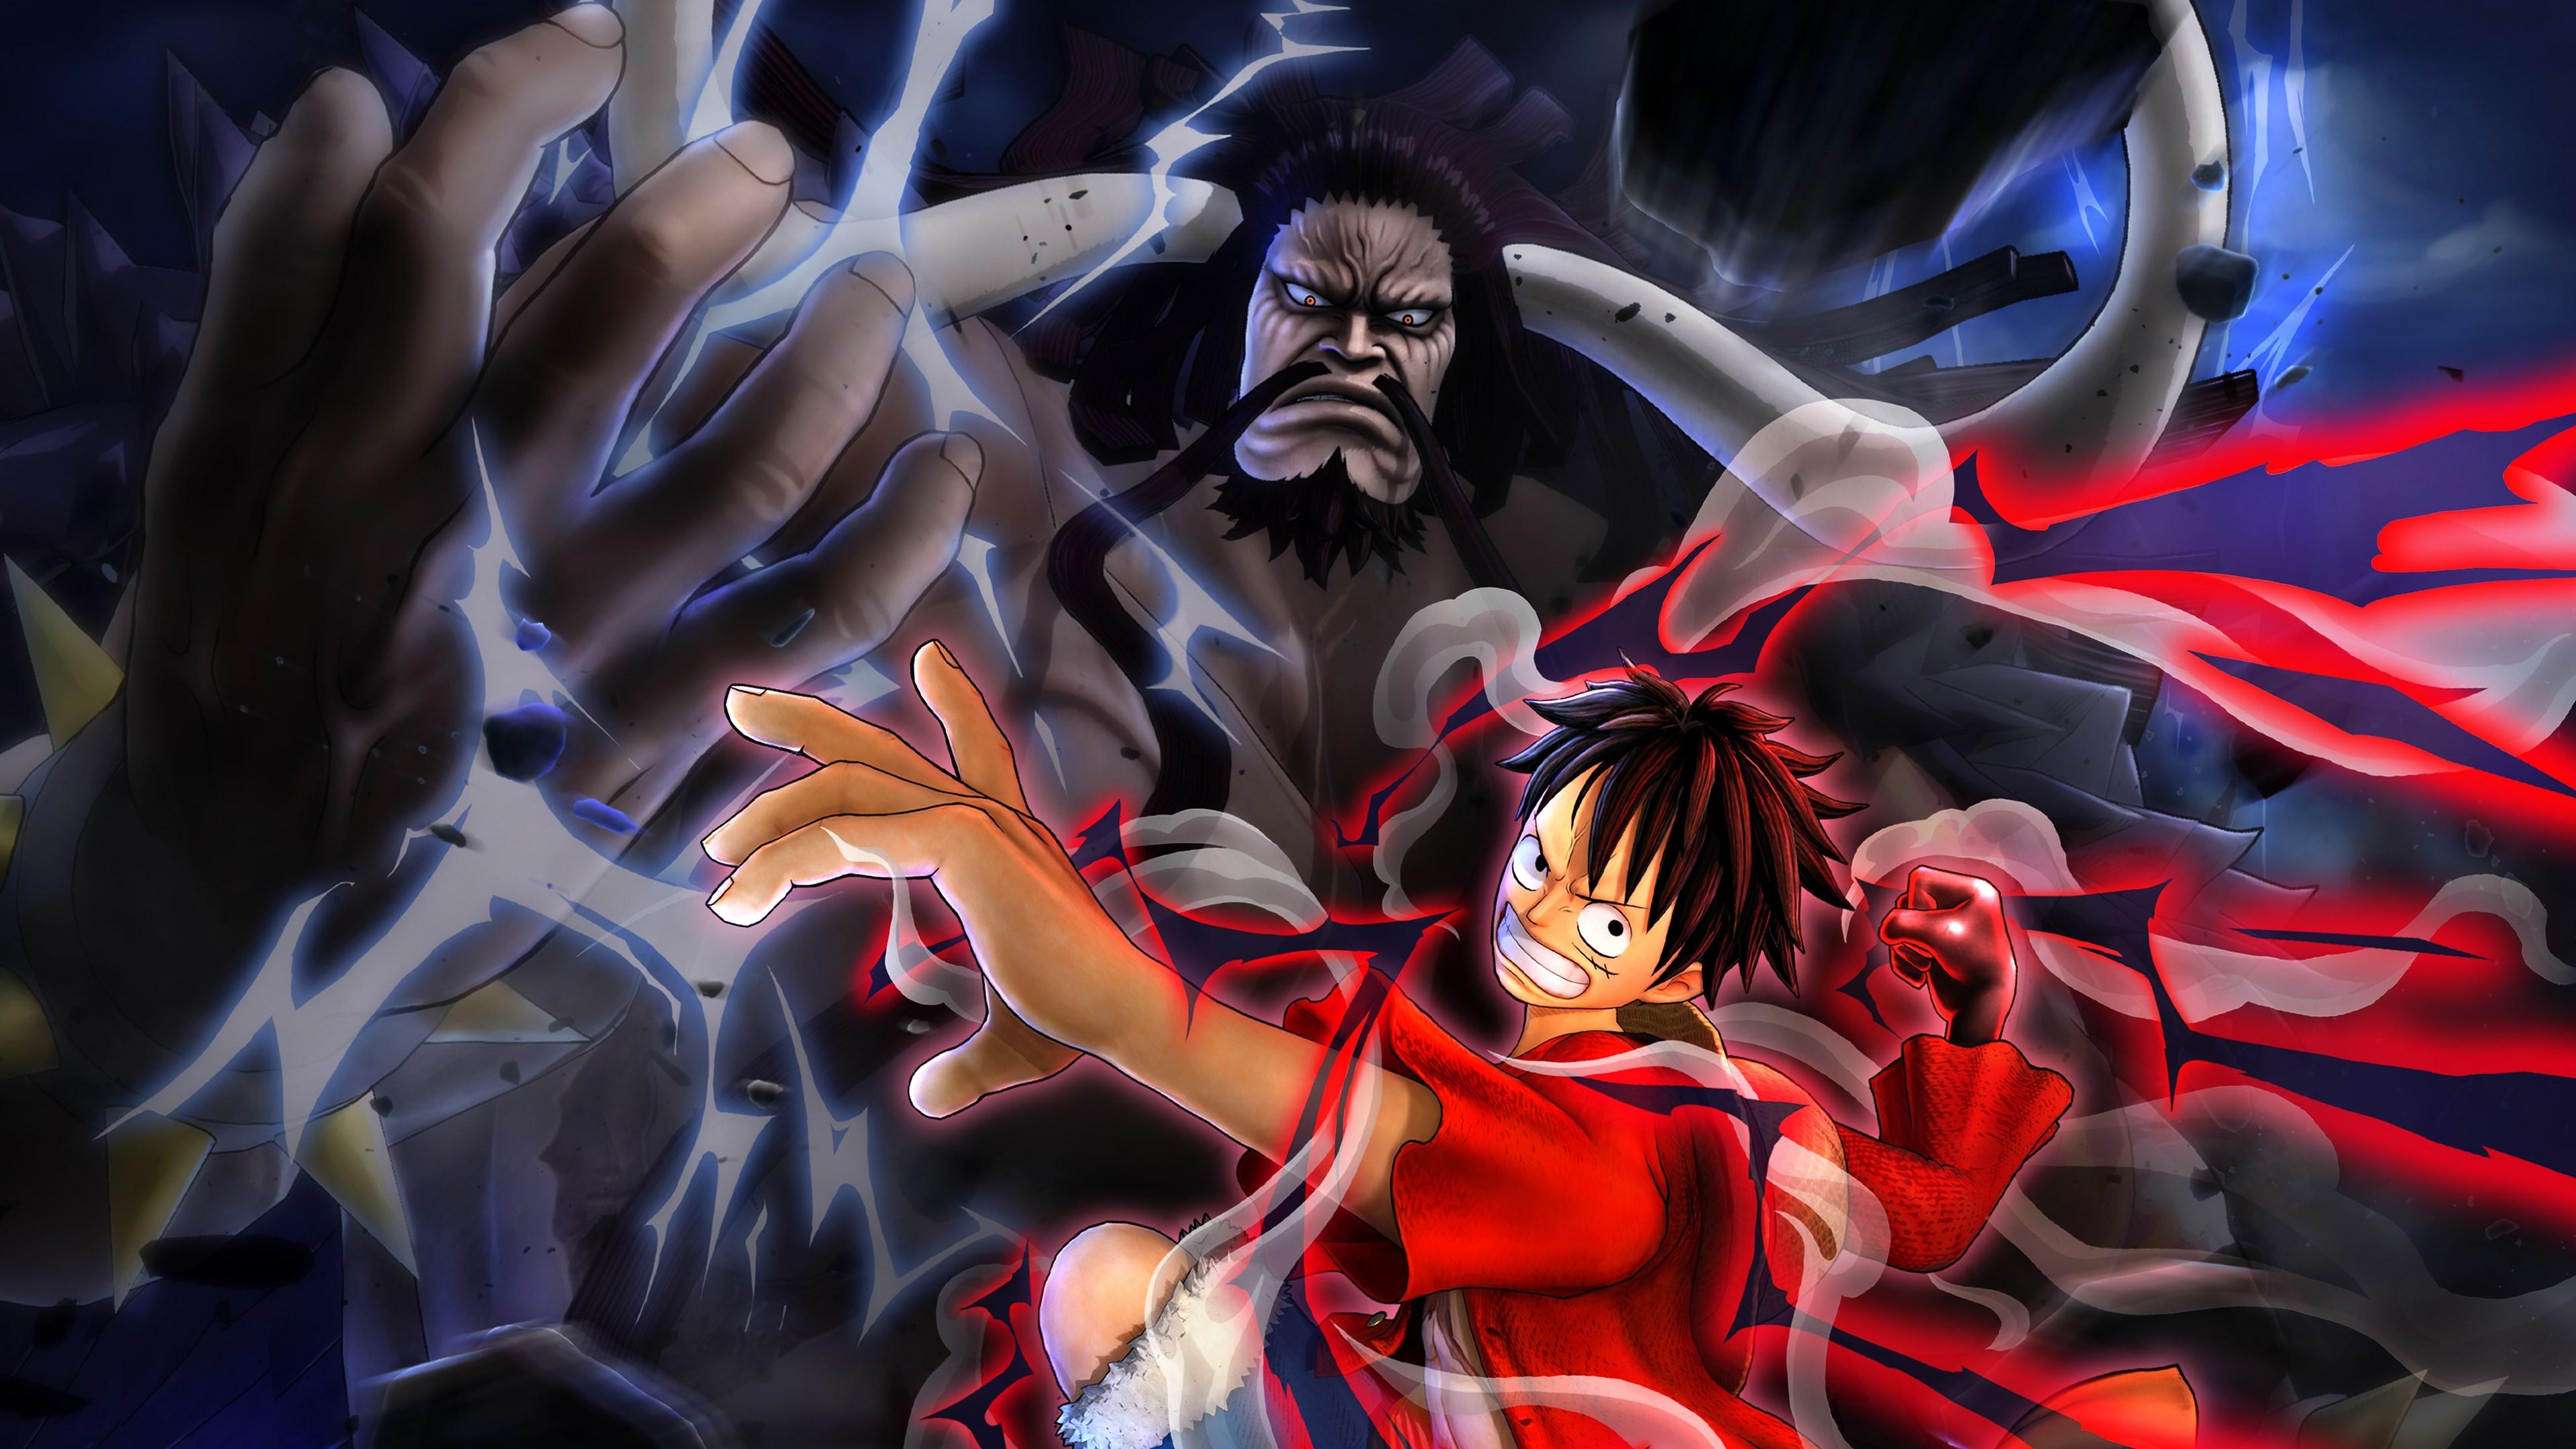 One Piece Pirate Warriors Poster Wallpaper, HD Games 4K ...